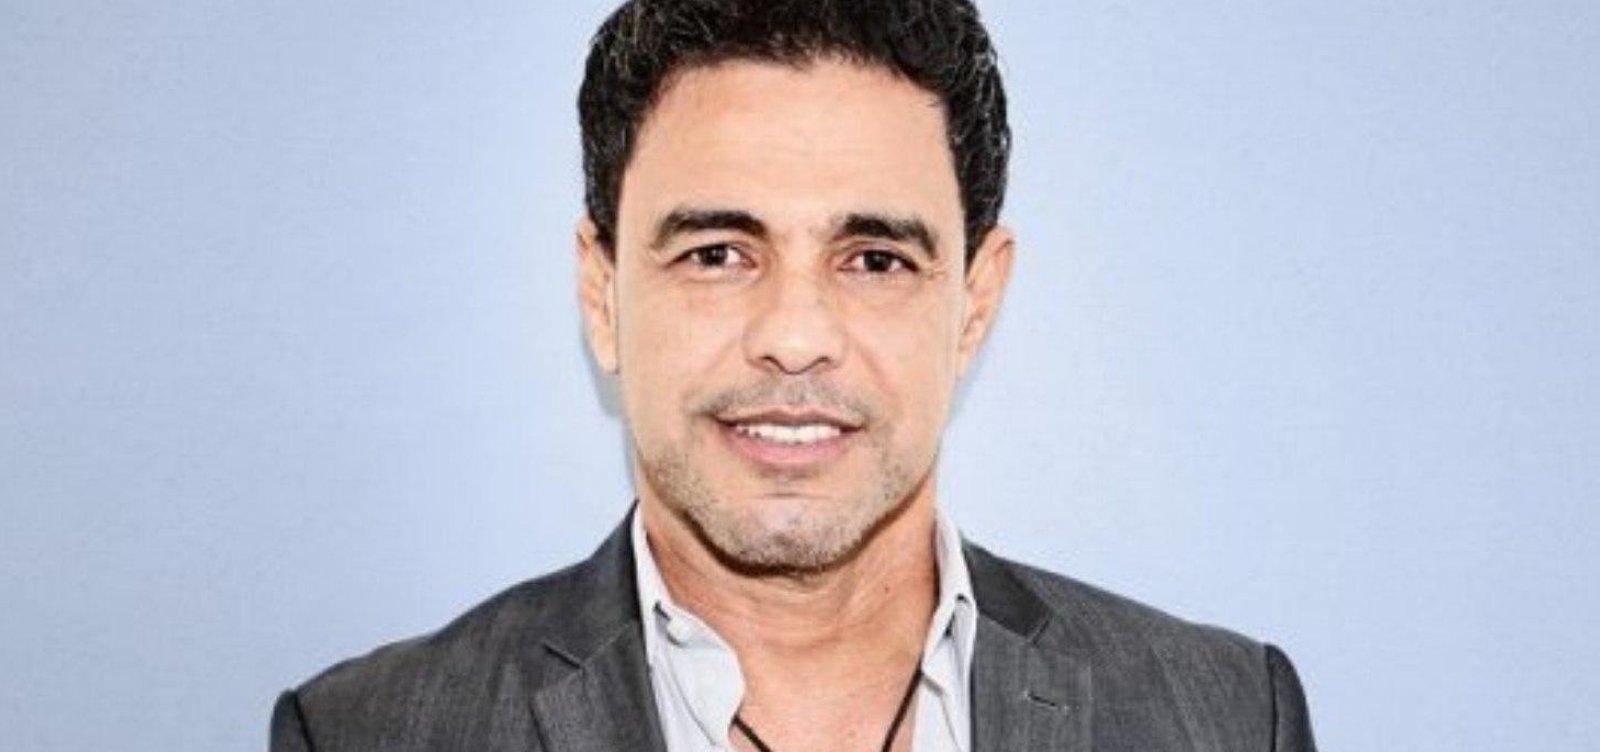 Zezé di Camargo se desculpa após chamar fã de 'idiota' nas redes sociais